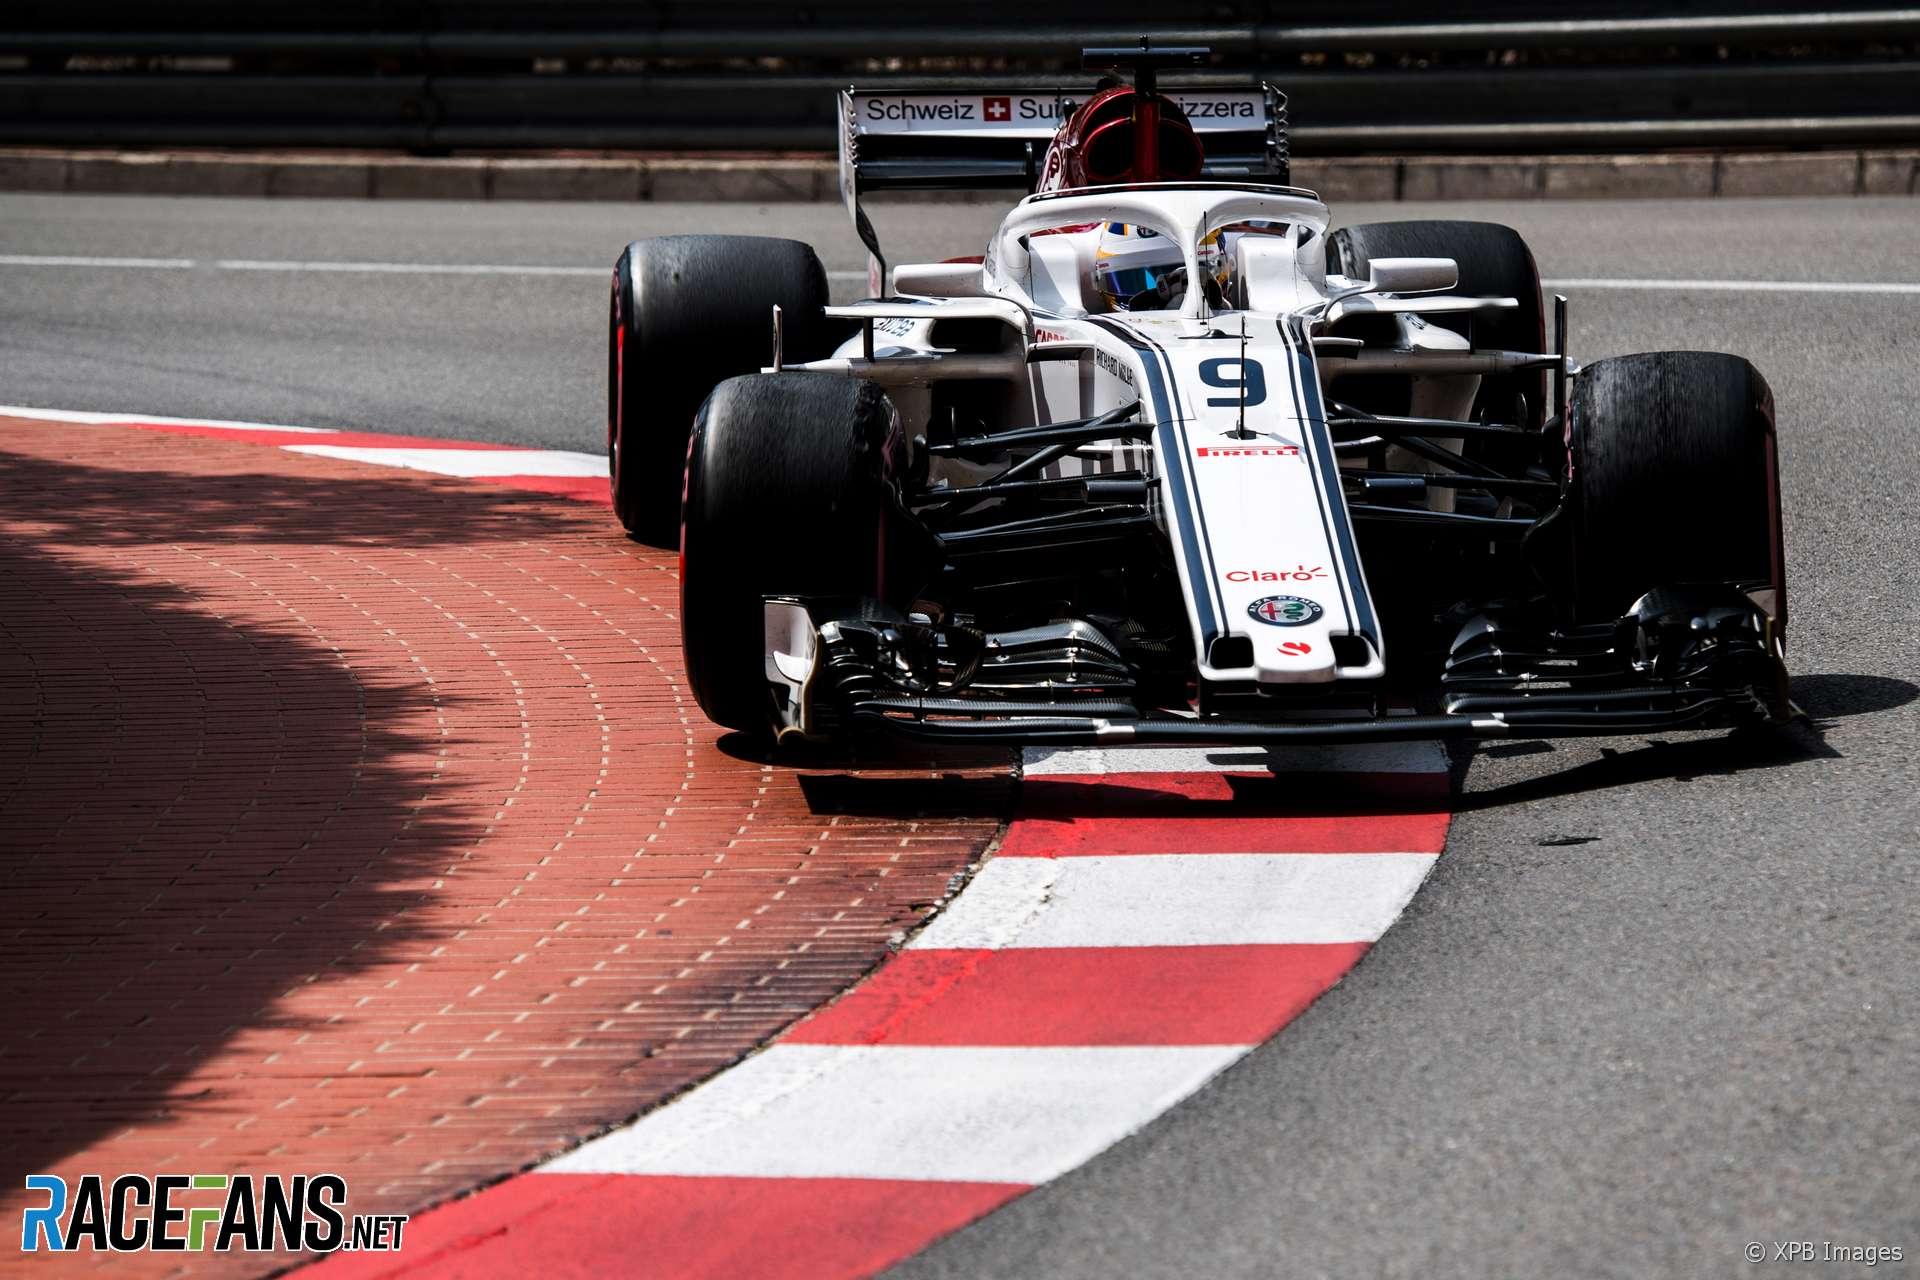 Marcus Ericsson, Sauber, Monaco, 2018